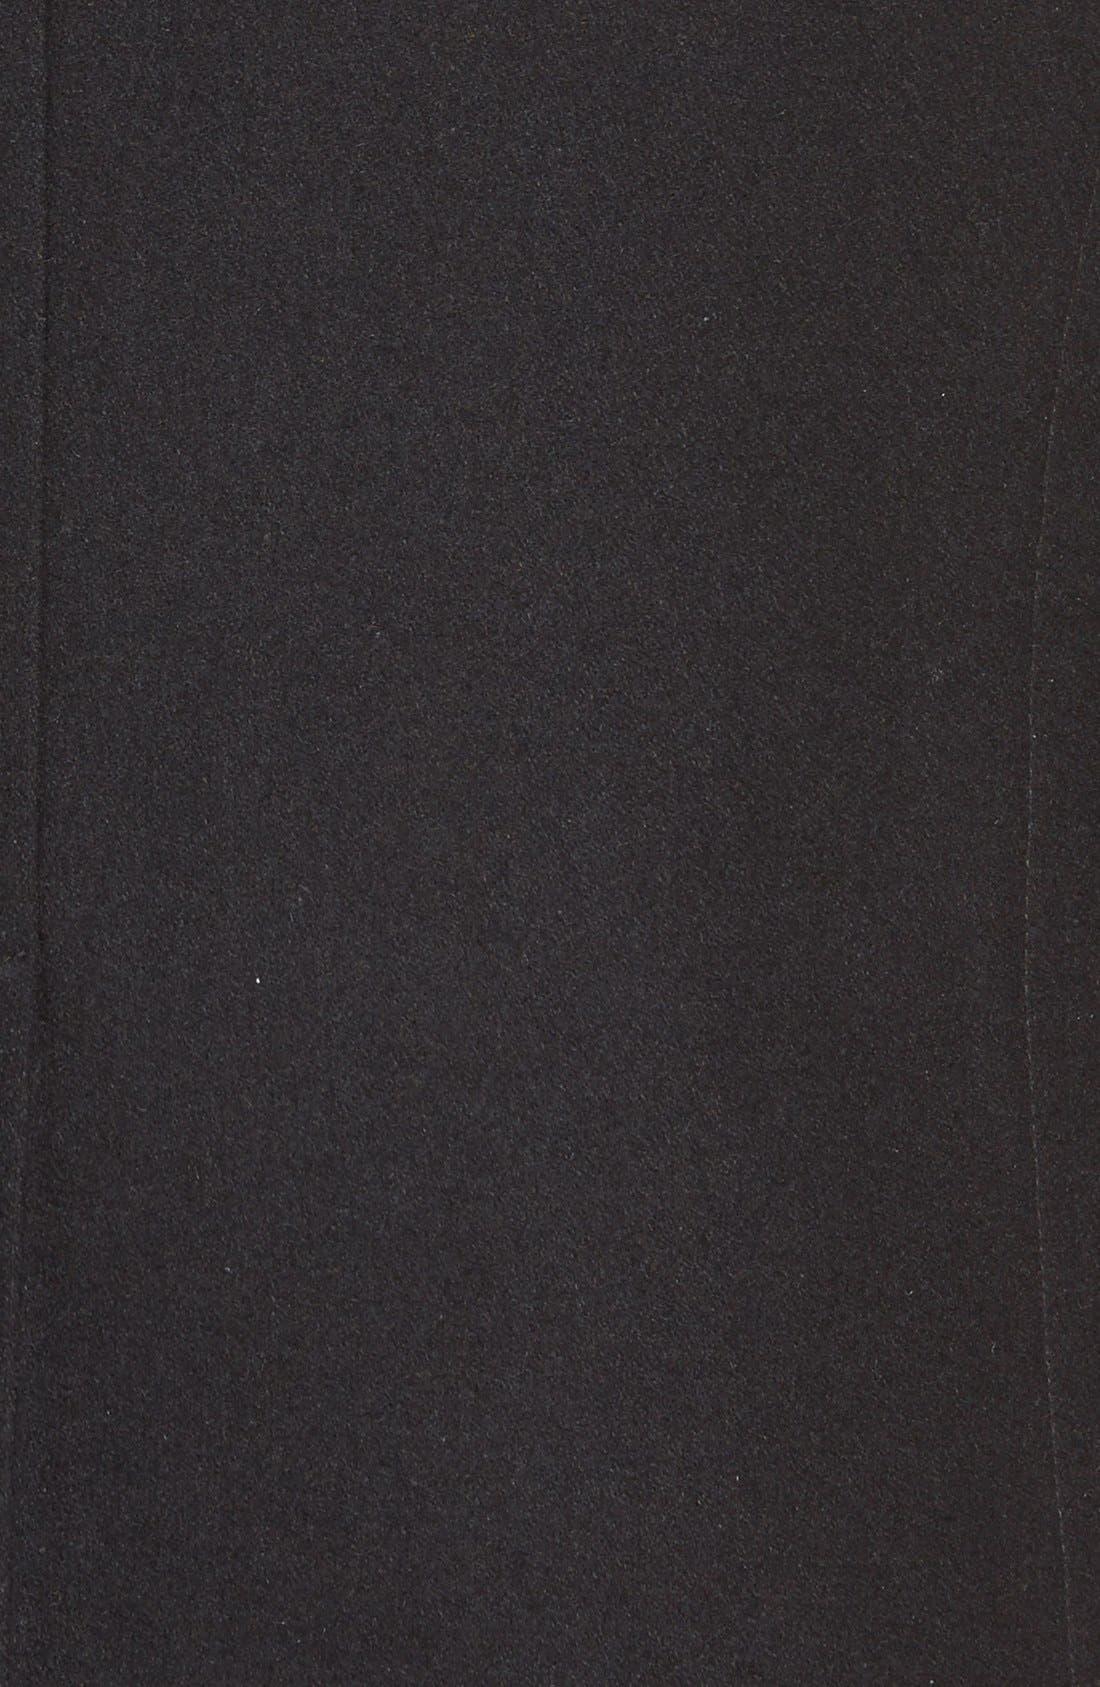 MICHAEL KORS,                             Car Coat,                             Alternate thumbnail 2, color,                             001